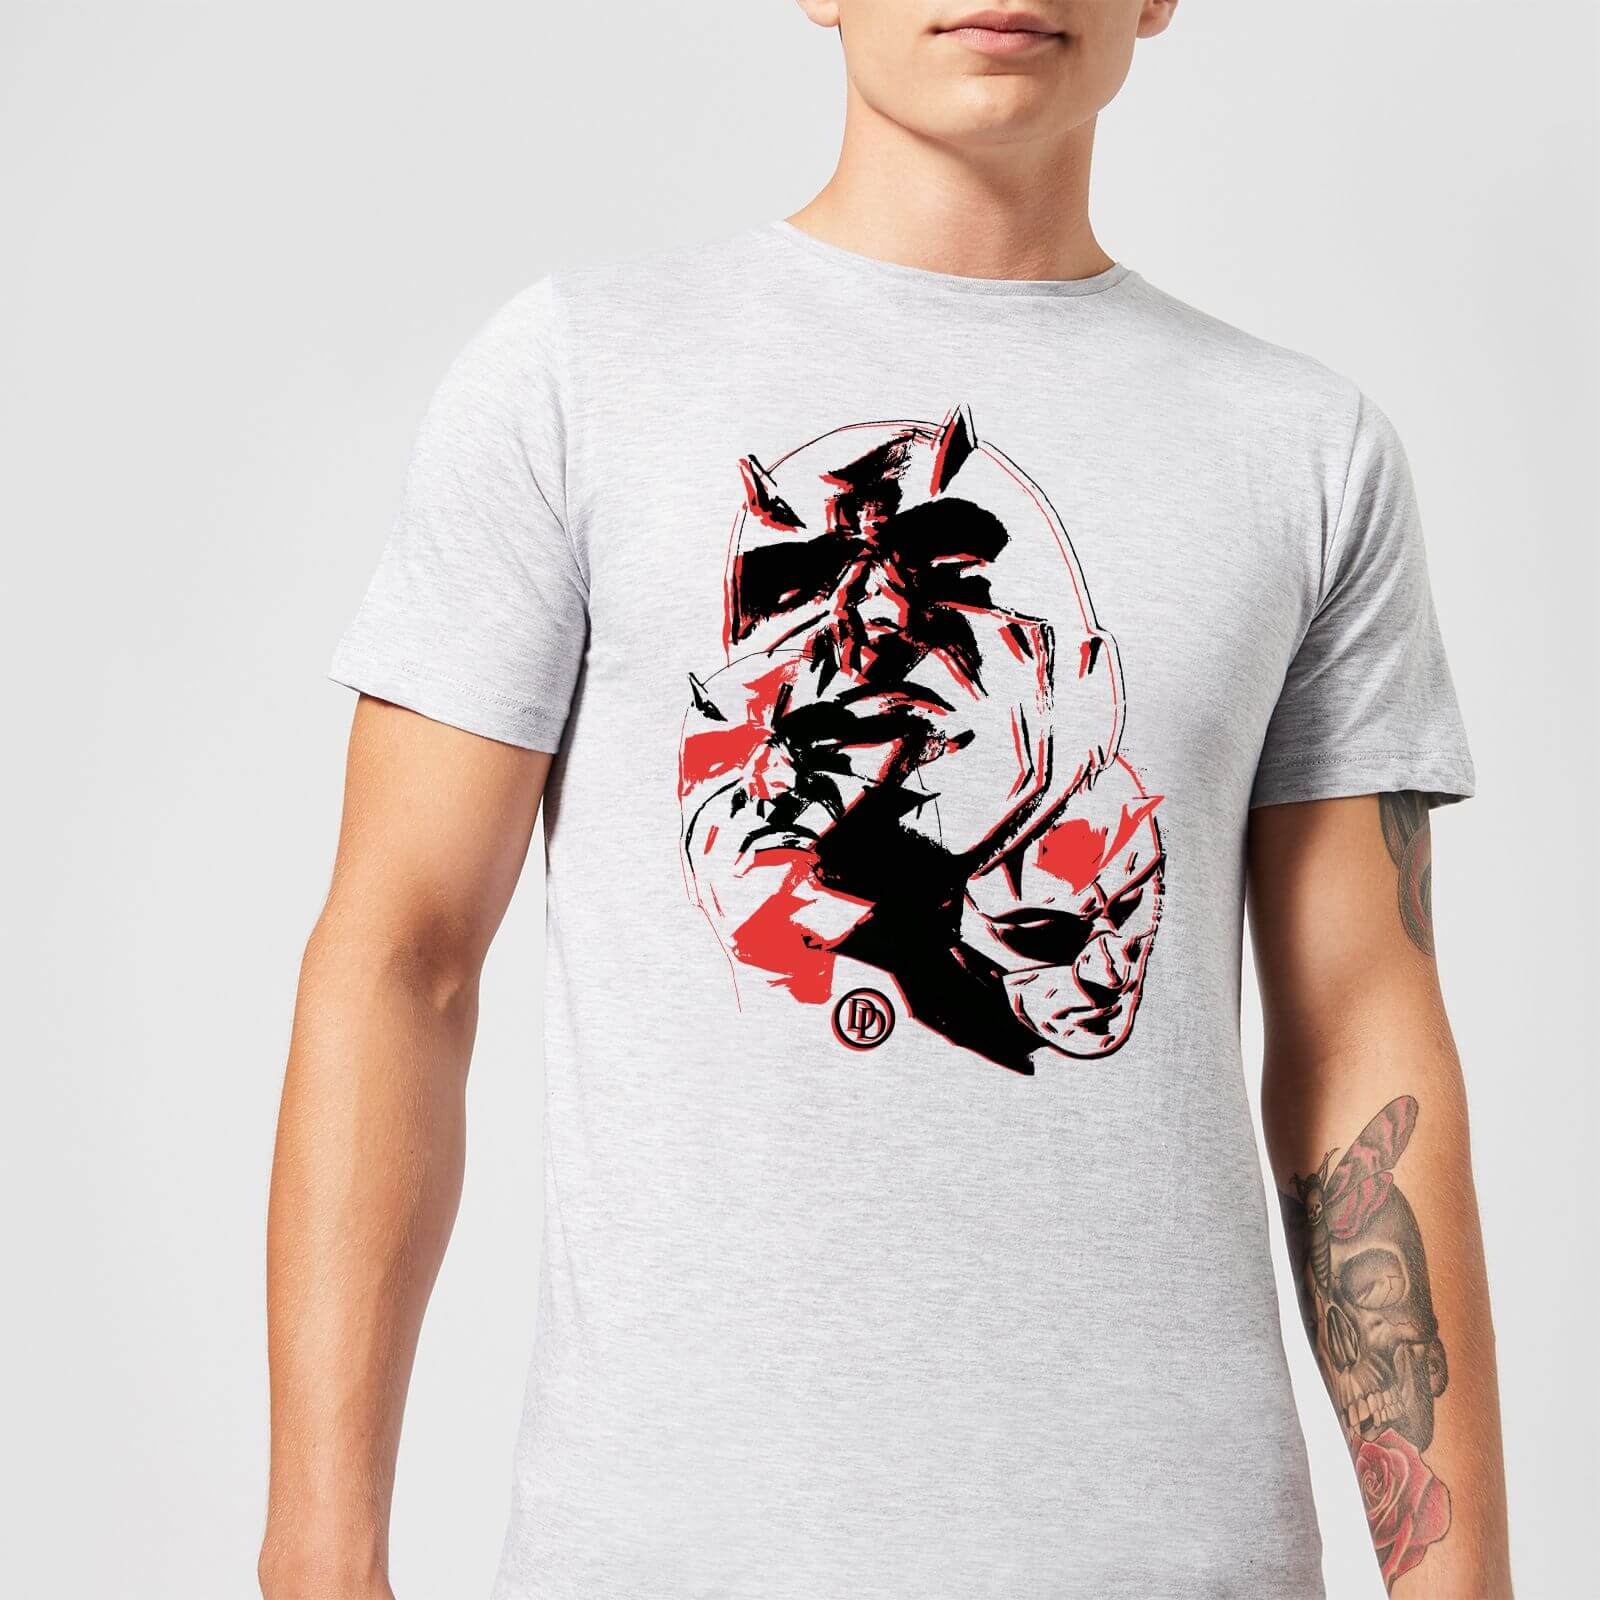 OfferteWeb.click 51-t-shirt-marvel-knights-daredevil-layered-faces-grigio